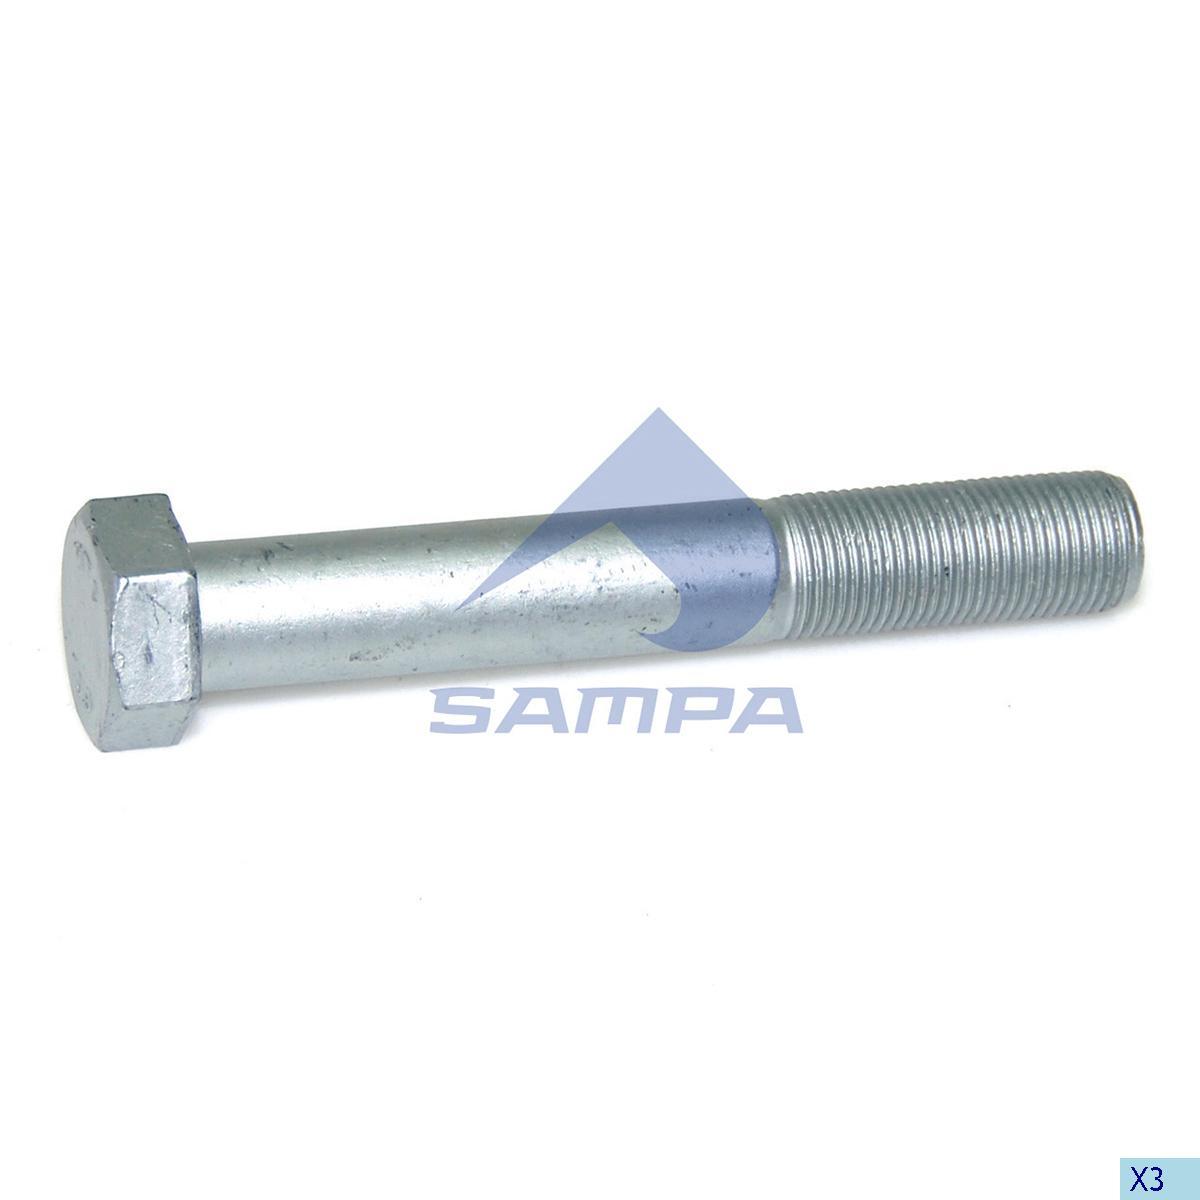 Screw, Axle Rod, R.V.I., Suspension